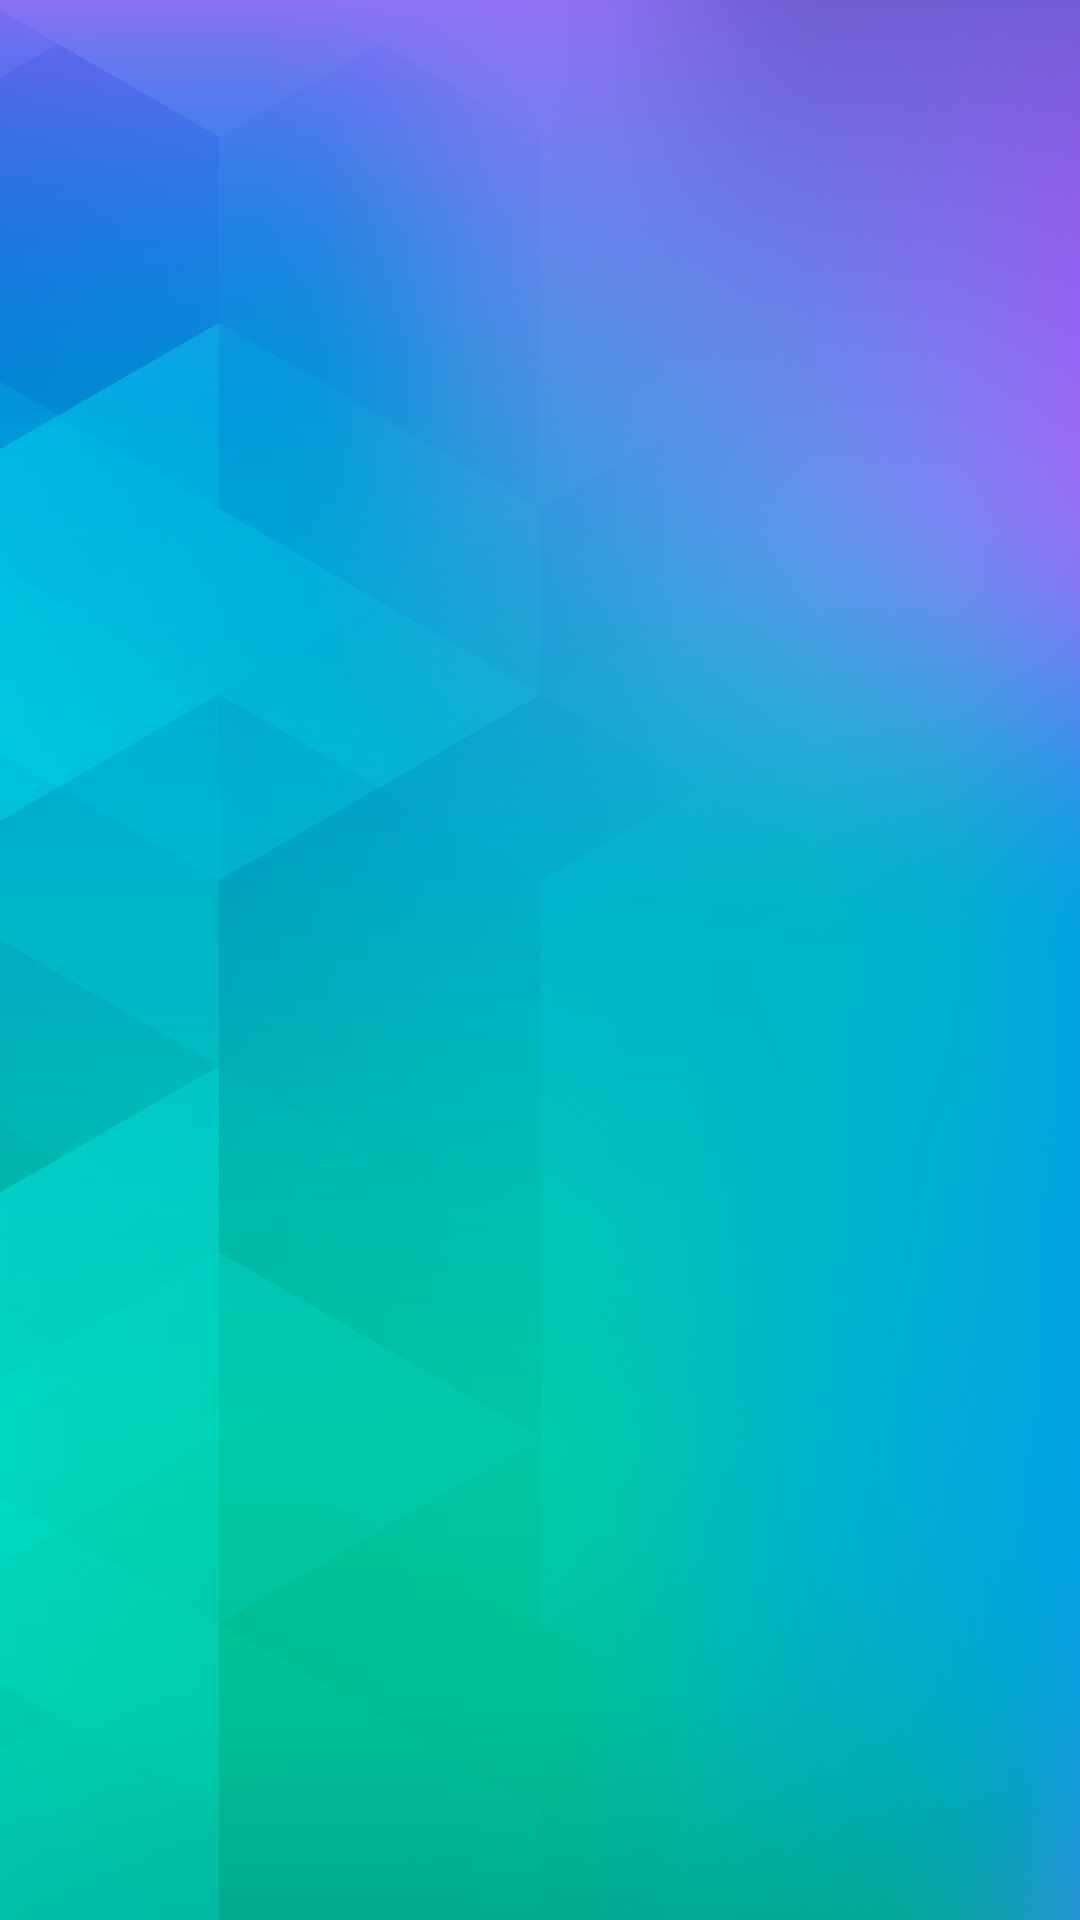 Rush Iphone Wallpaper Download Yu Yunicorn Full Hd Stock Wallpapers